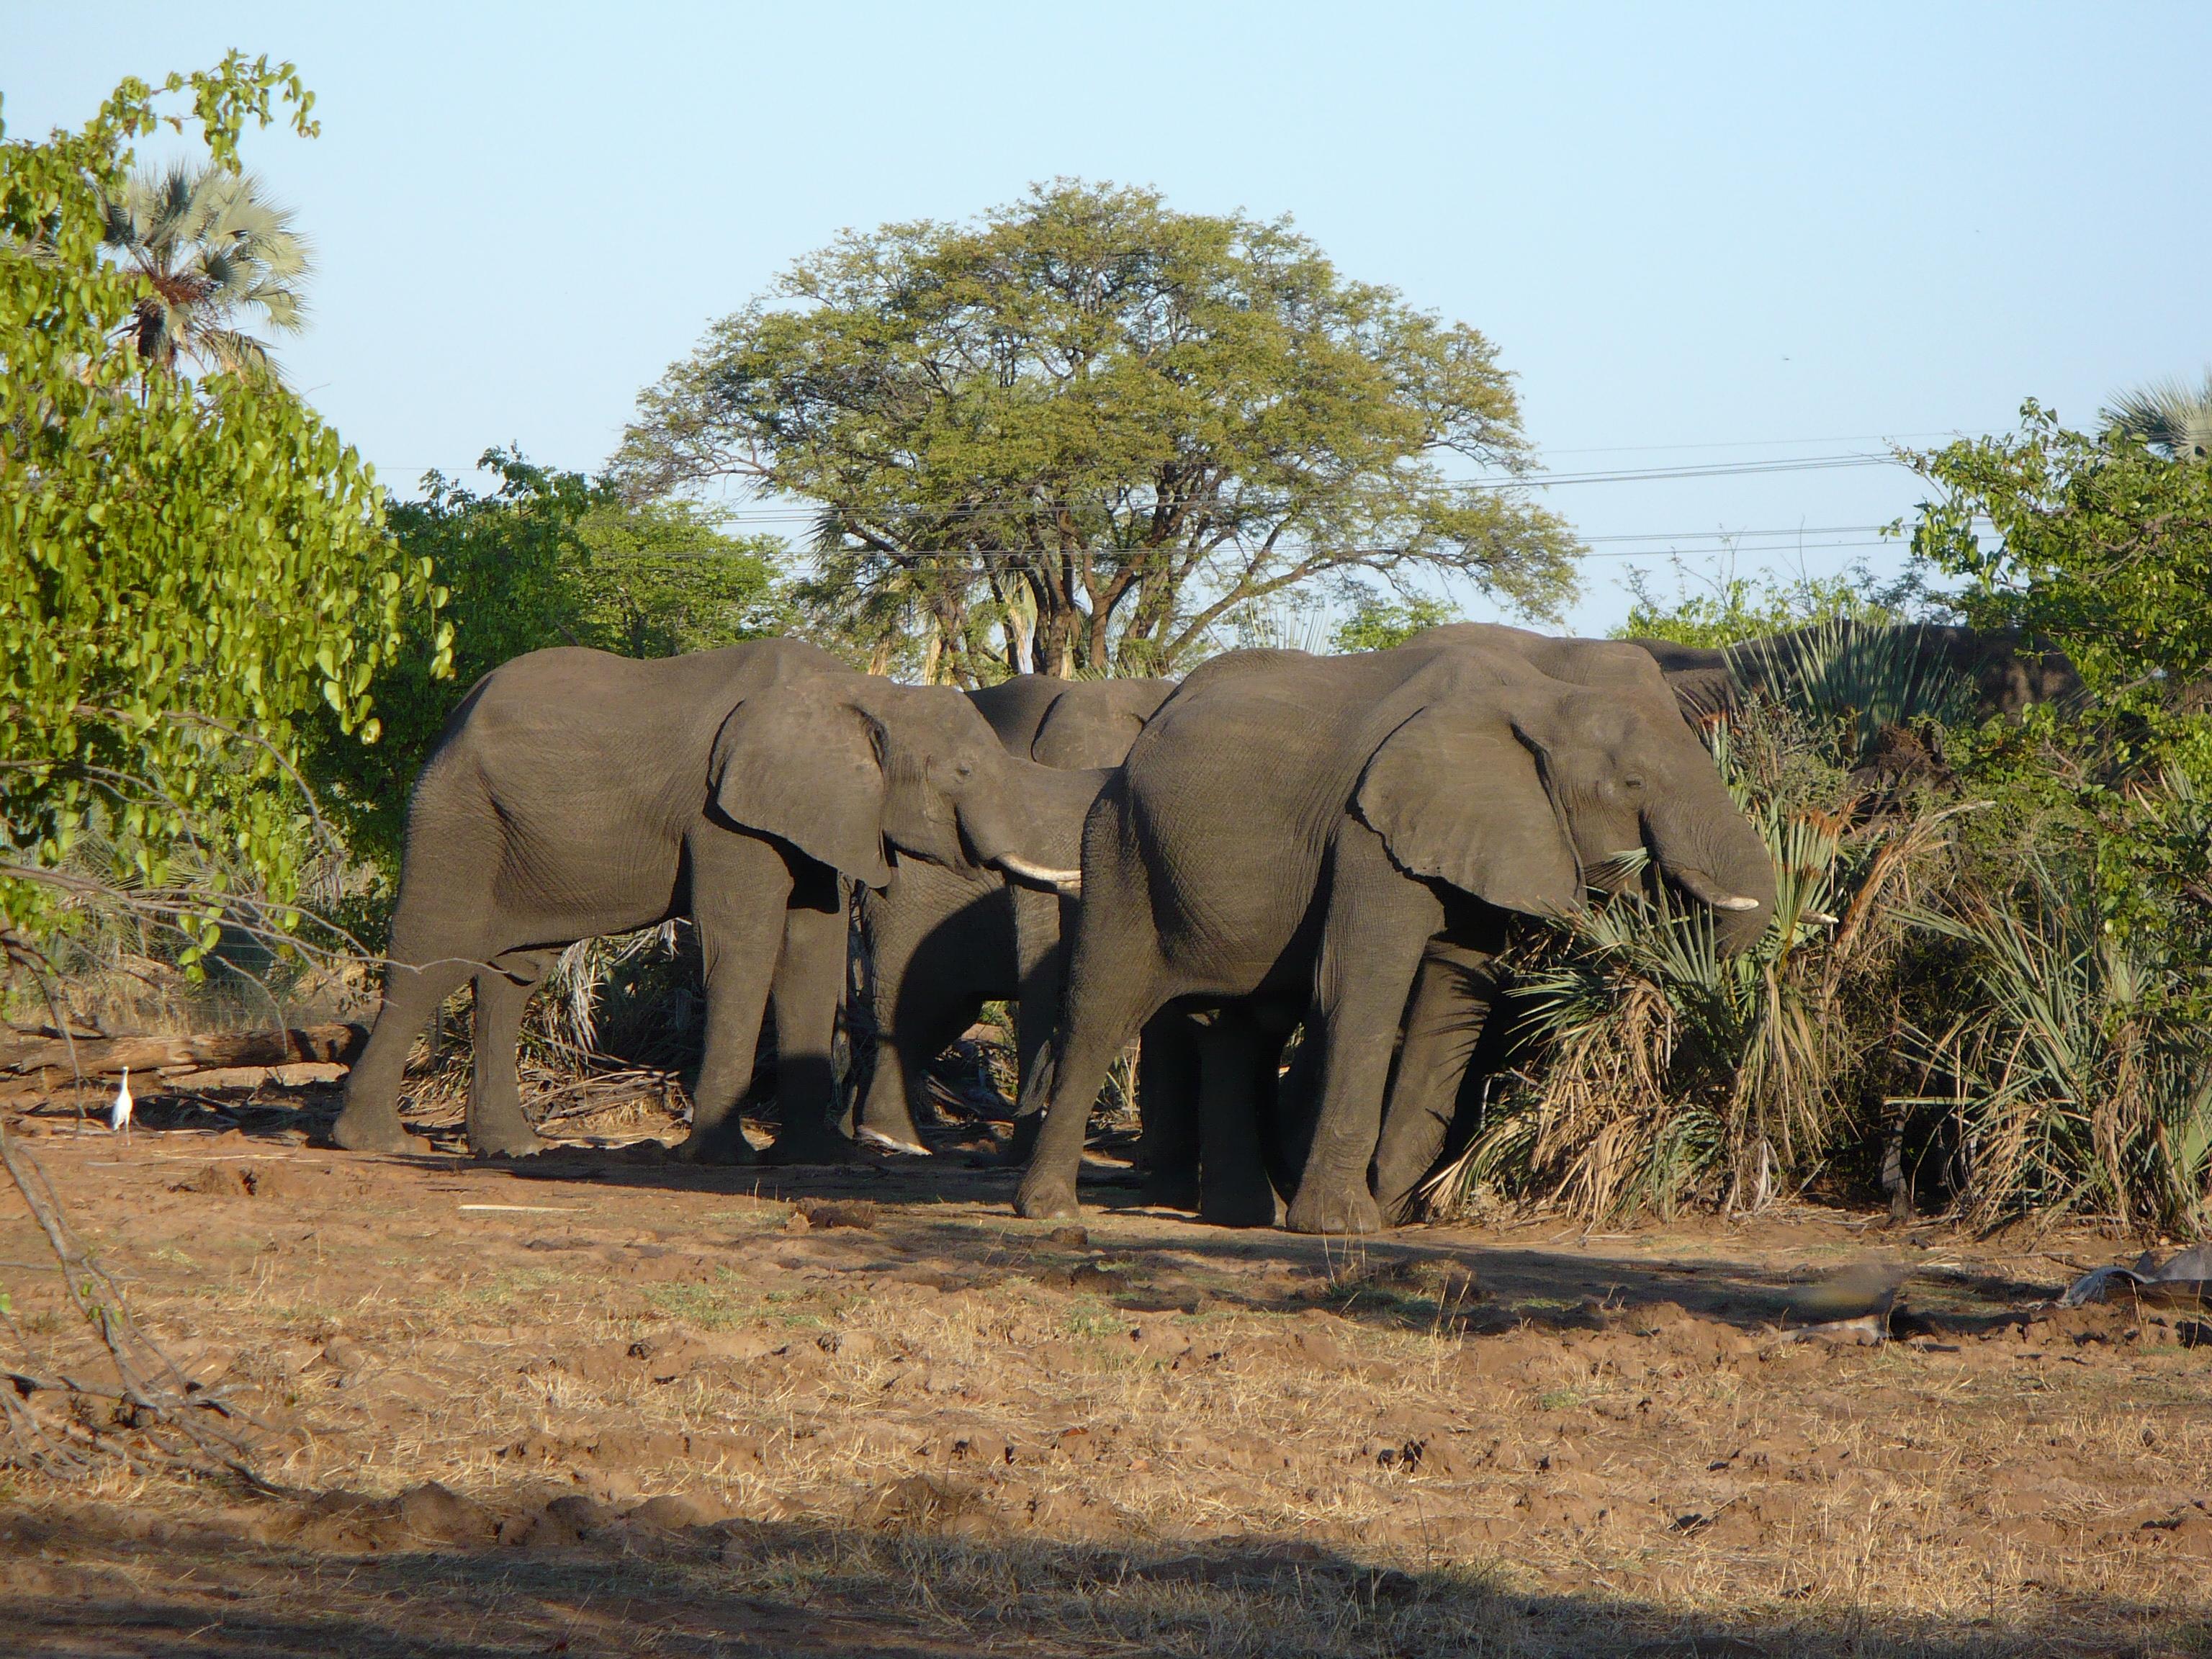 Elephant in Mosi-oa-Tunya National Park, Zambia